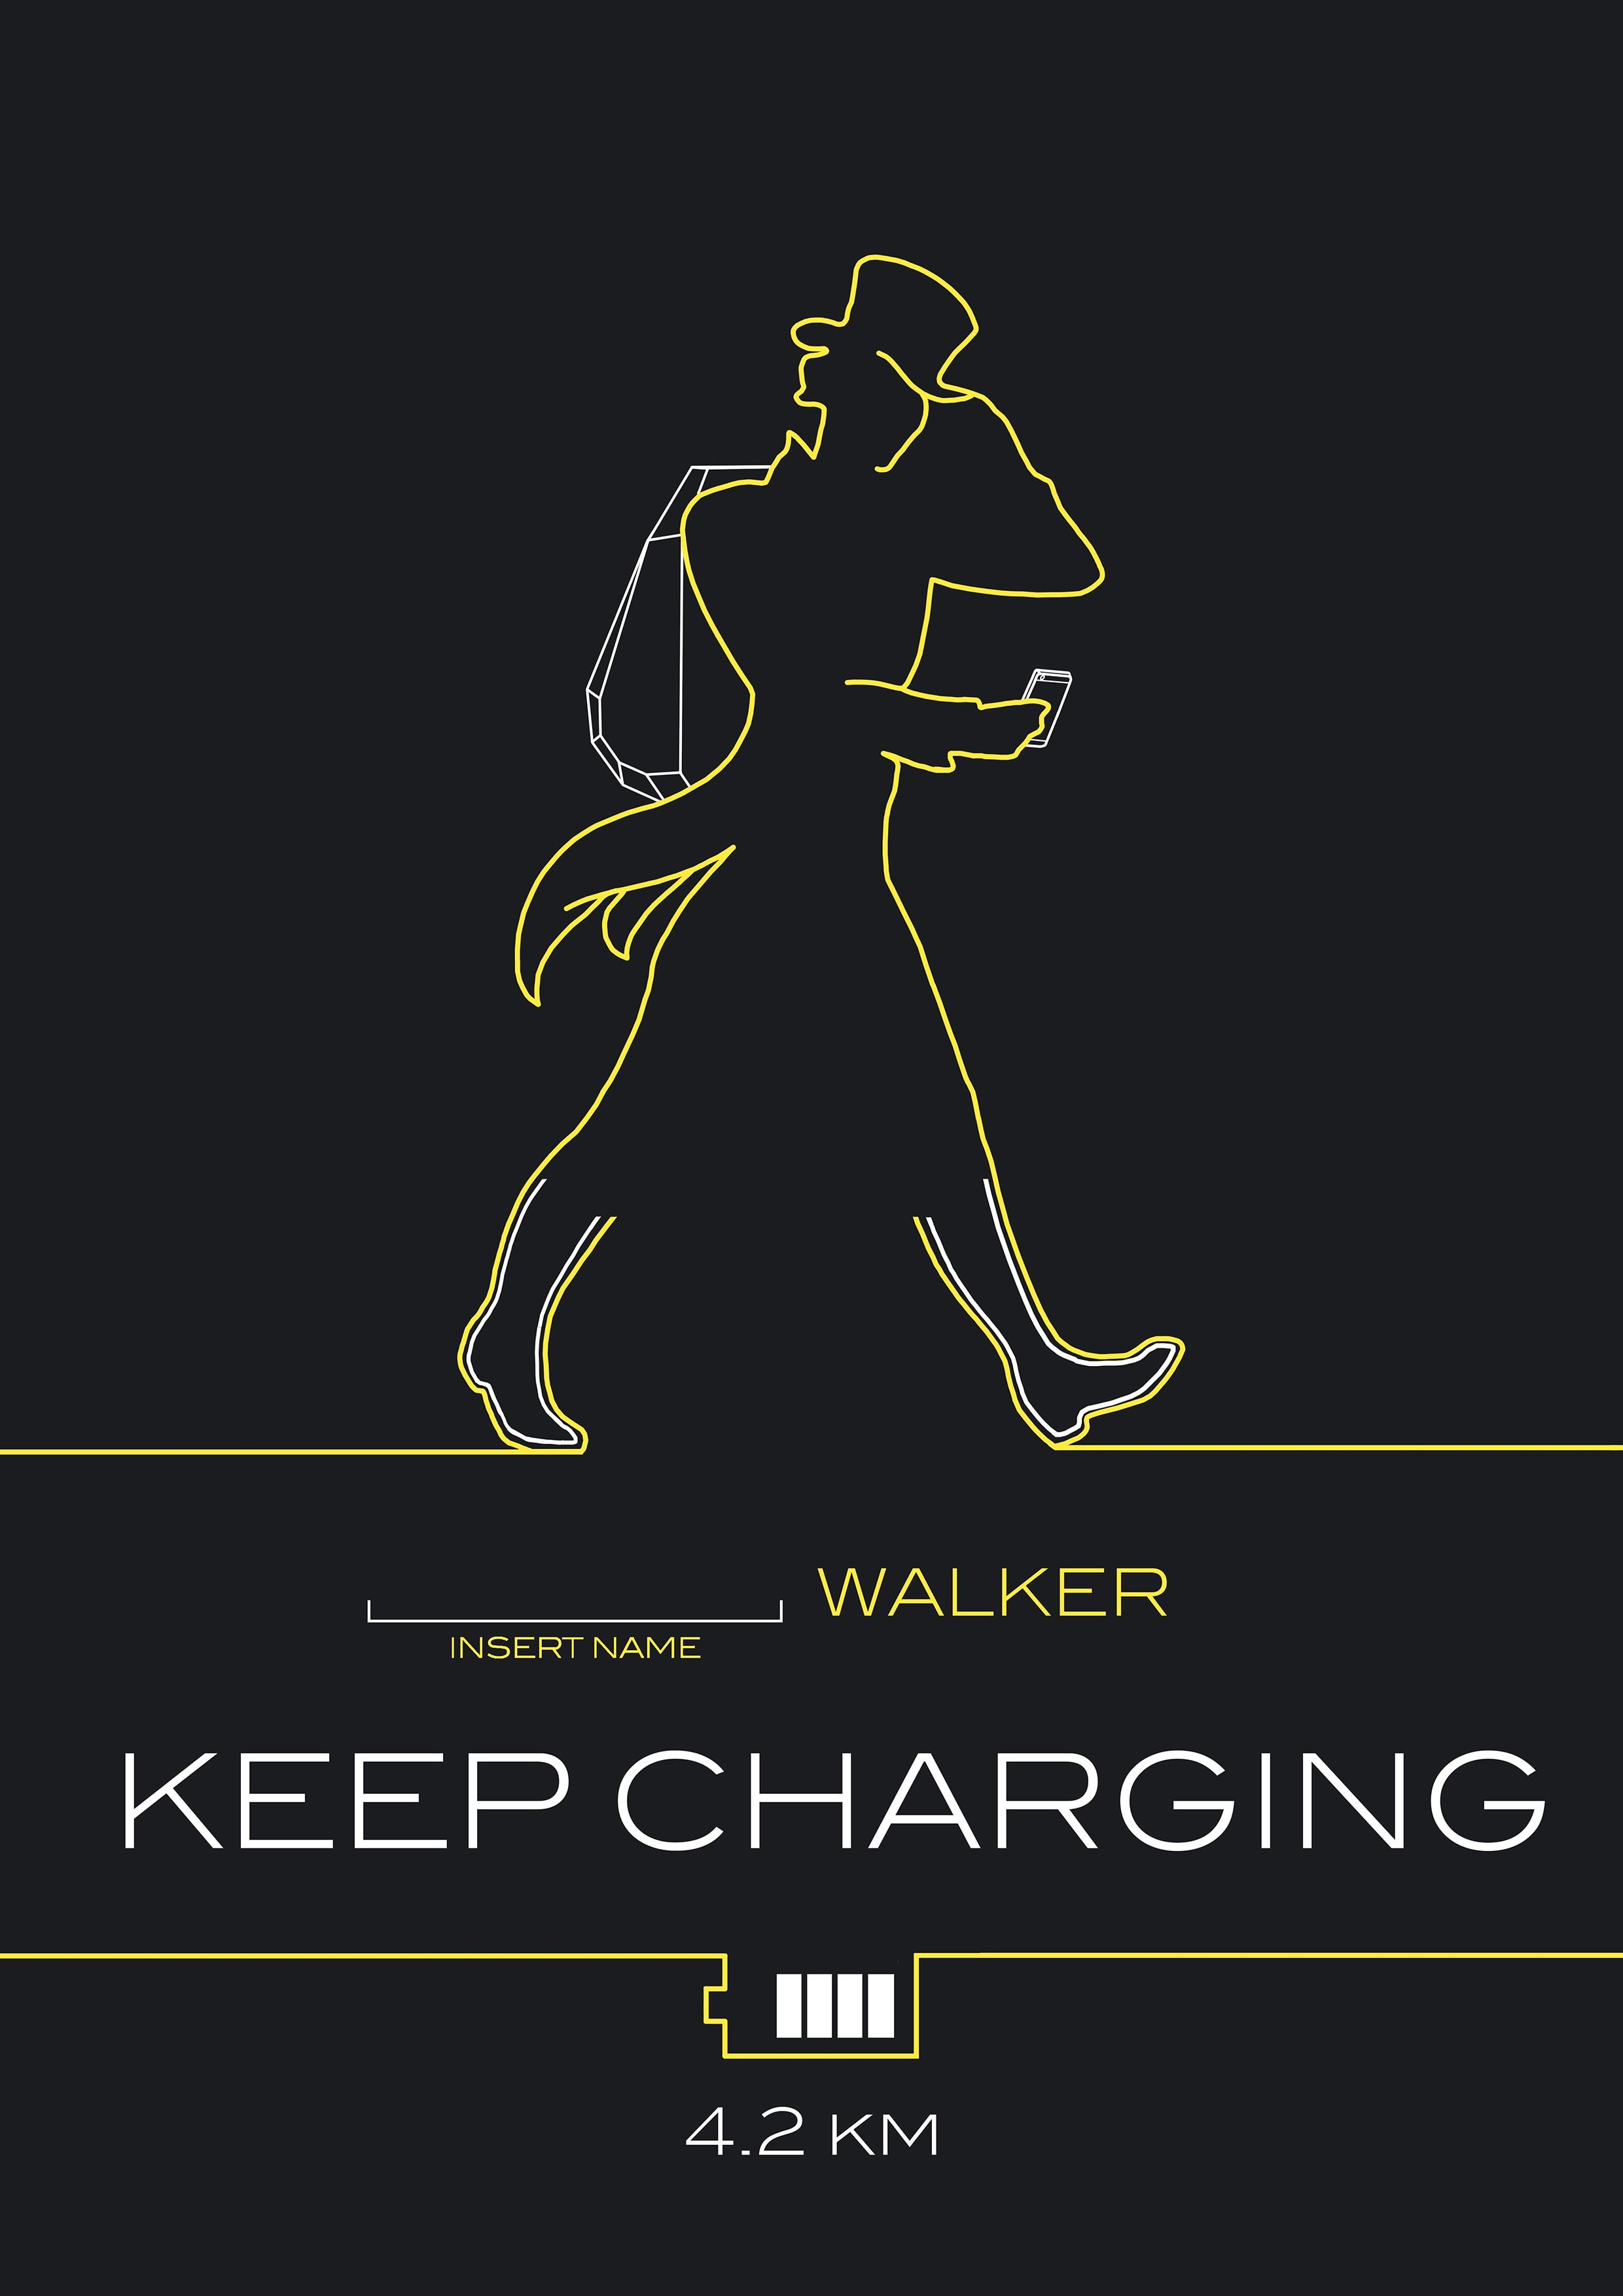 KEEP CHARGING